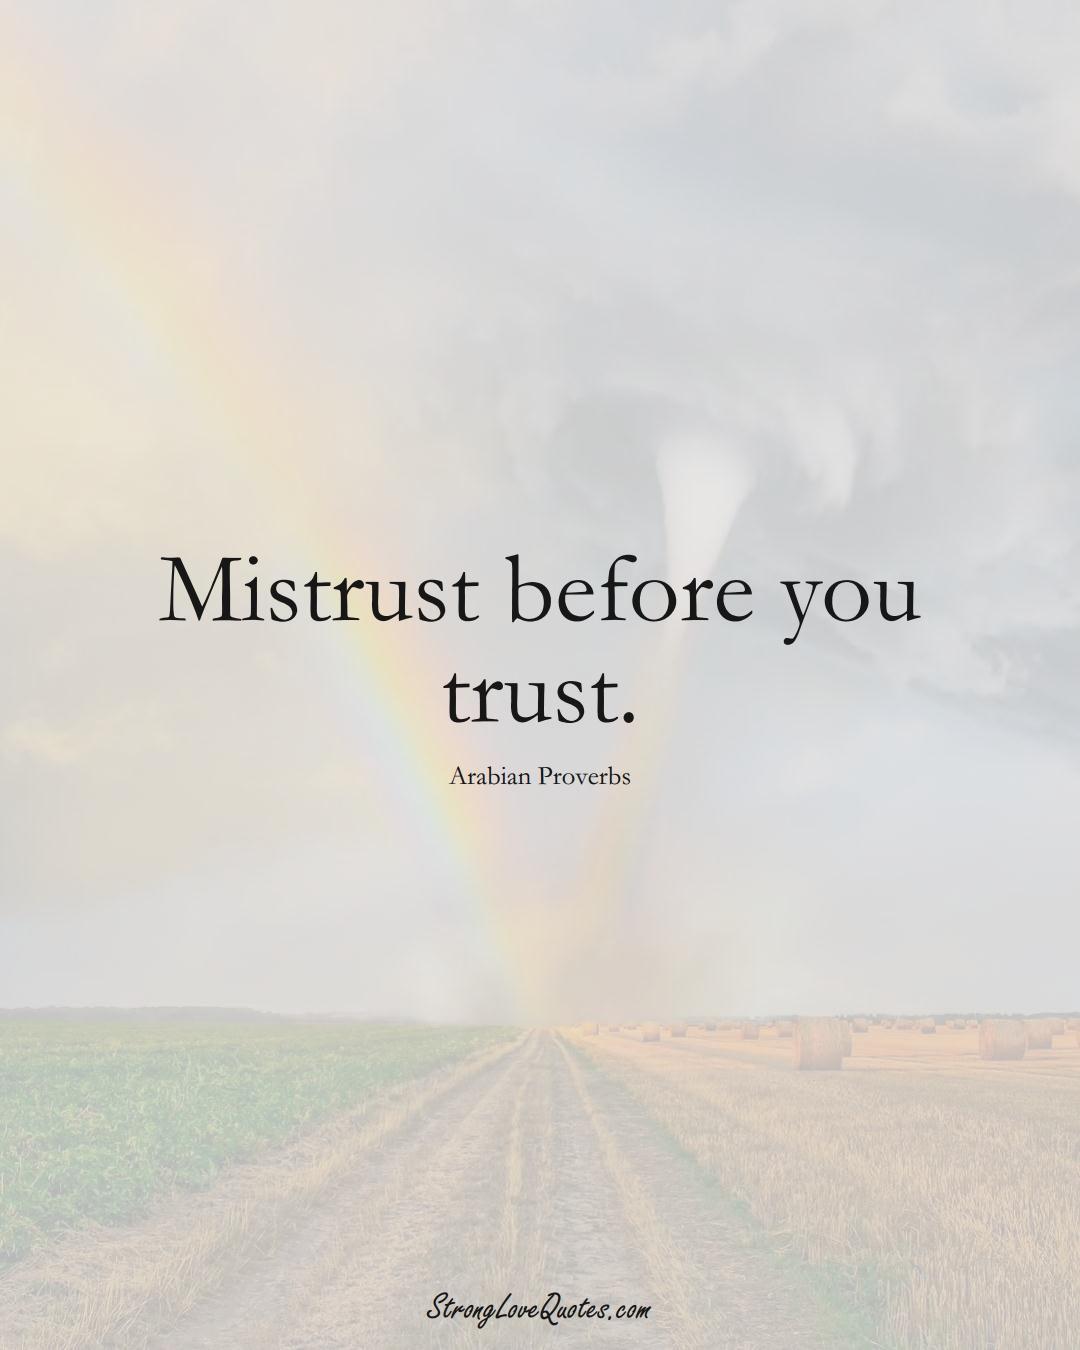 Mistrust before you trust. (Arabian Sayings);  #aVarietyofCulturesSayings